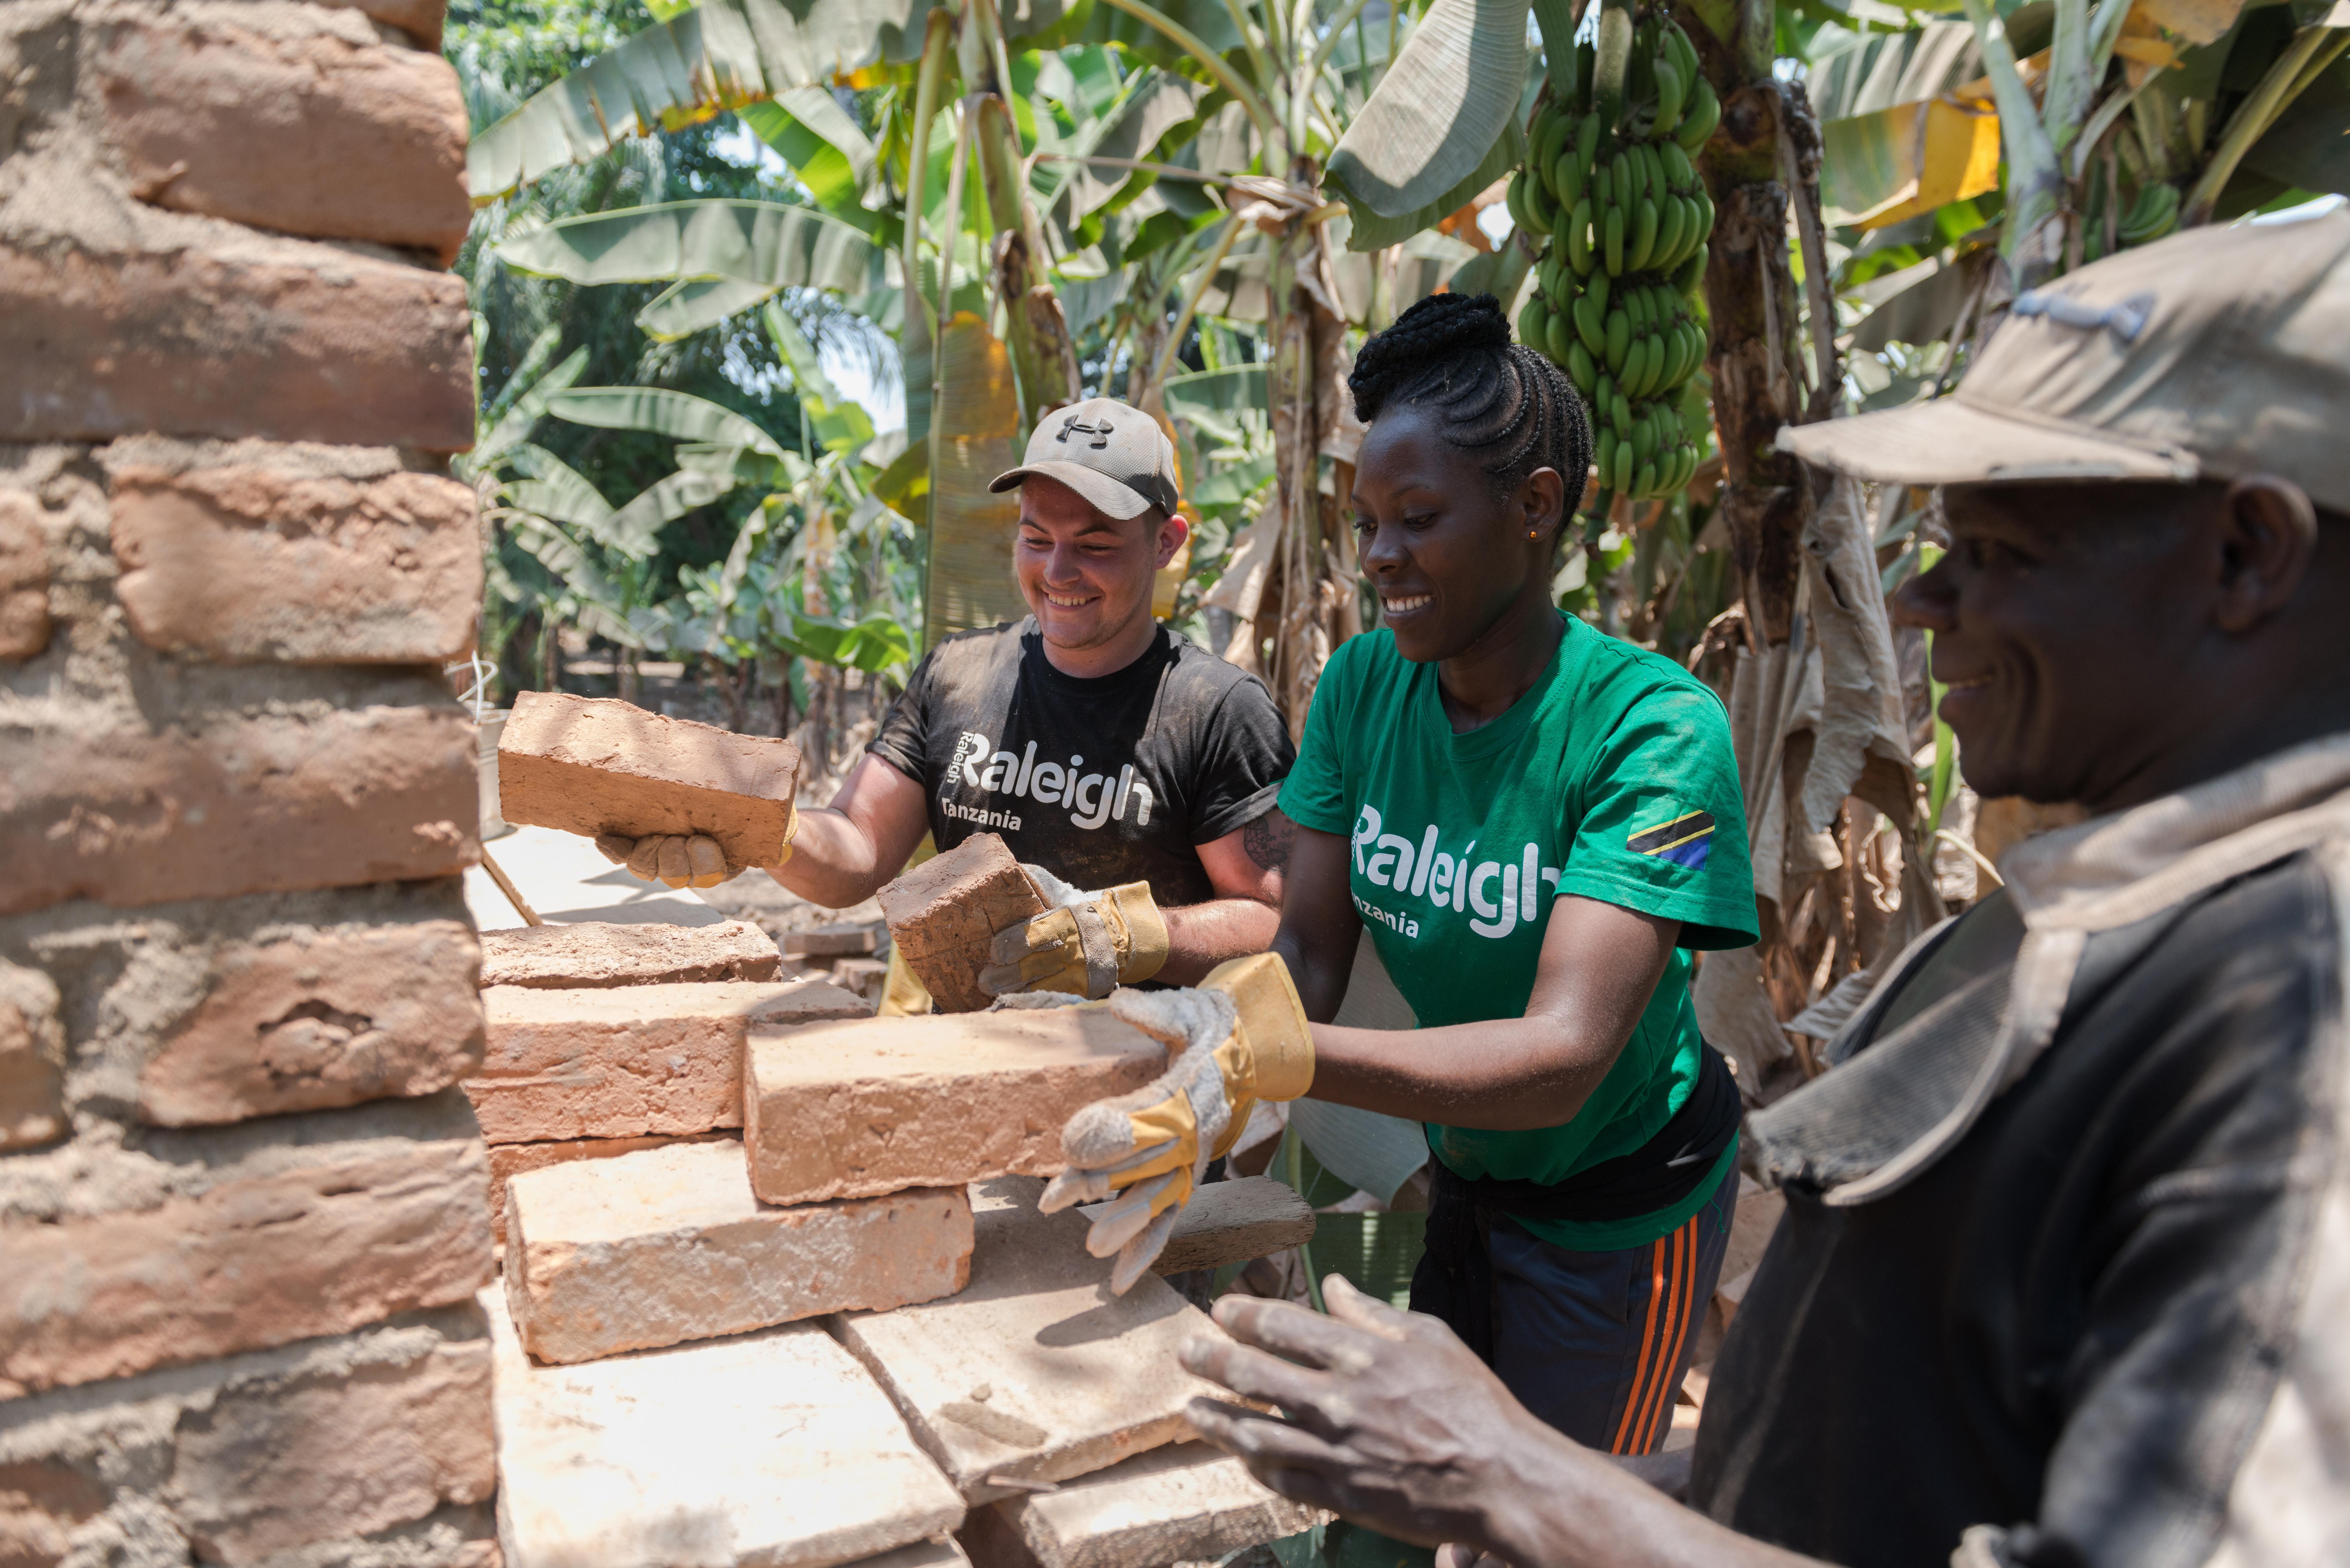 Summer Program - Community Center | Raleigh International - Summer 2020 Travel Abroad Program in Tanzania